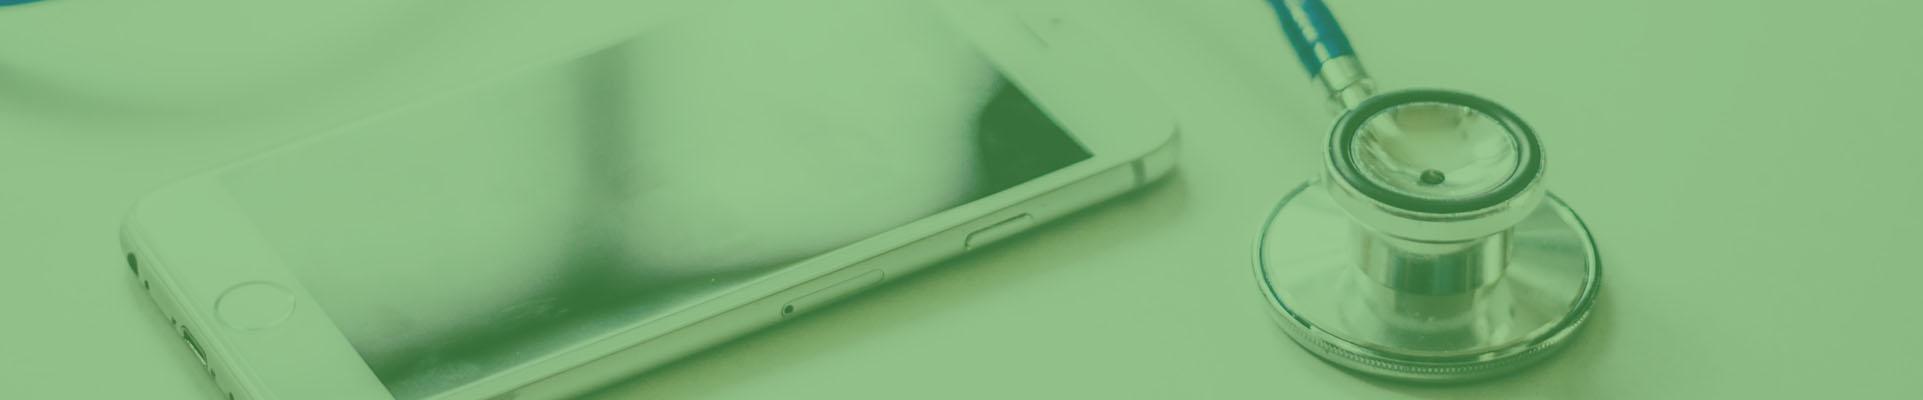 Smartphone reparatie arnhem header